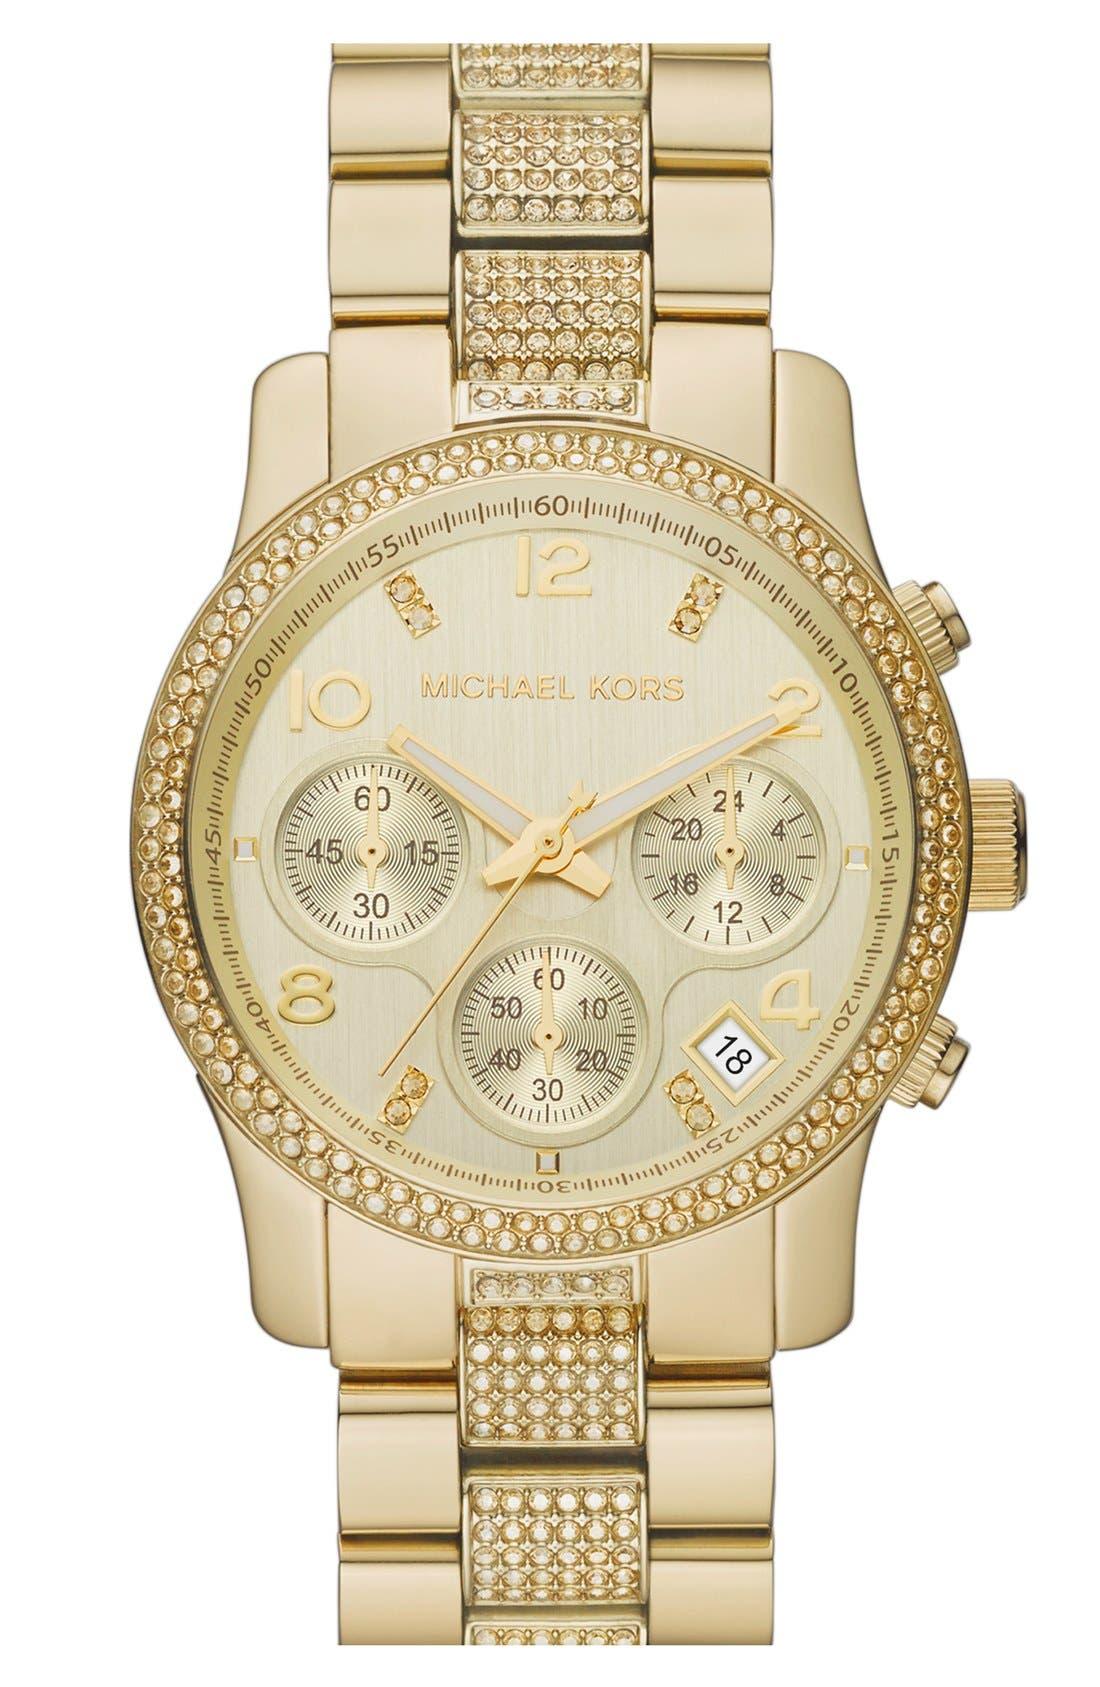 Main Image - Michael Kors 'Runway' Crystal Chronograph Bracelet Watch, 38mm